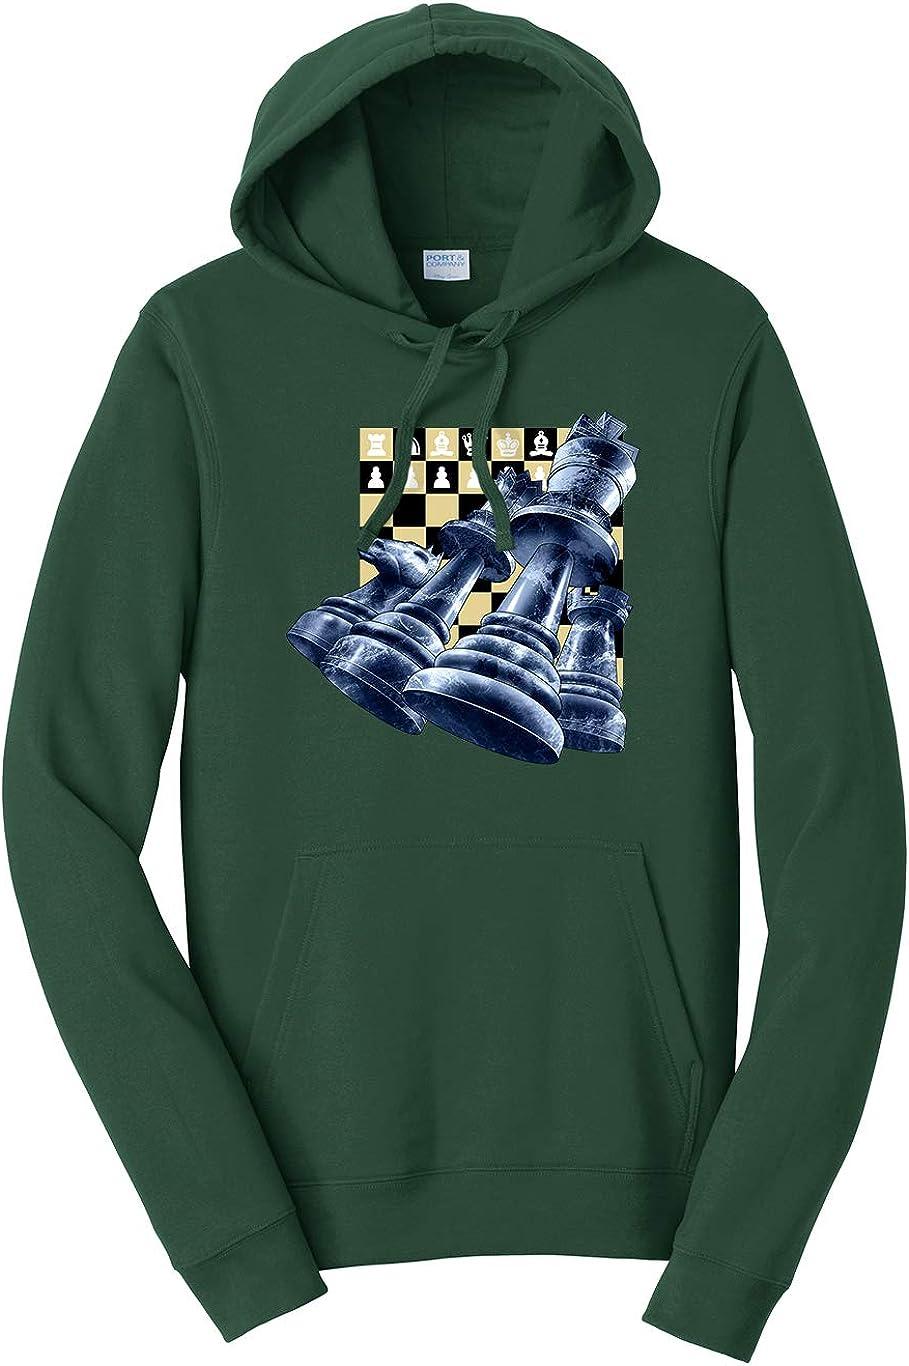 Tenacitee Unisex Chess Pieces Hooded Sweatshirt